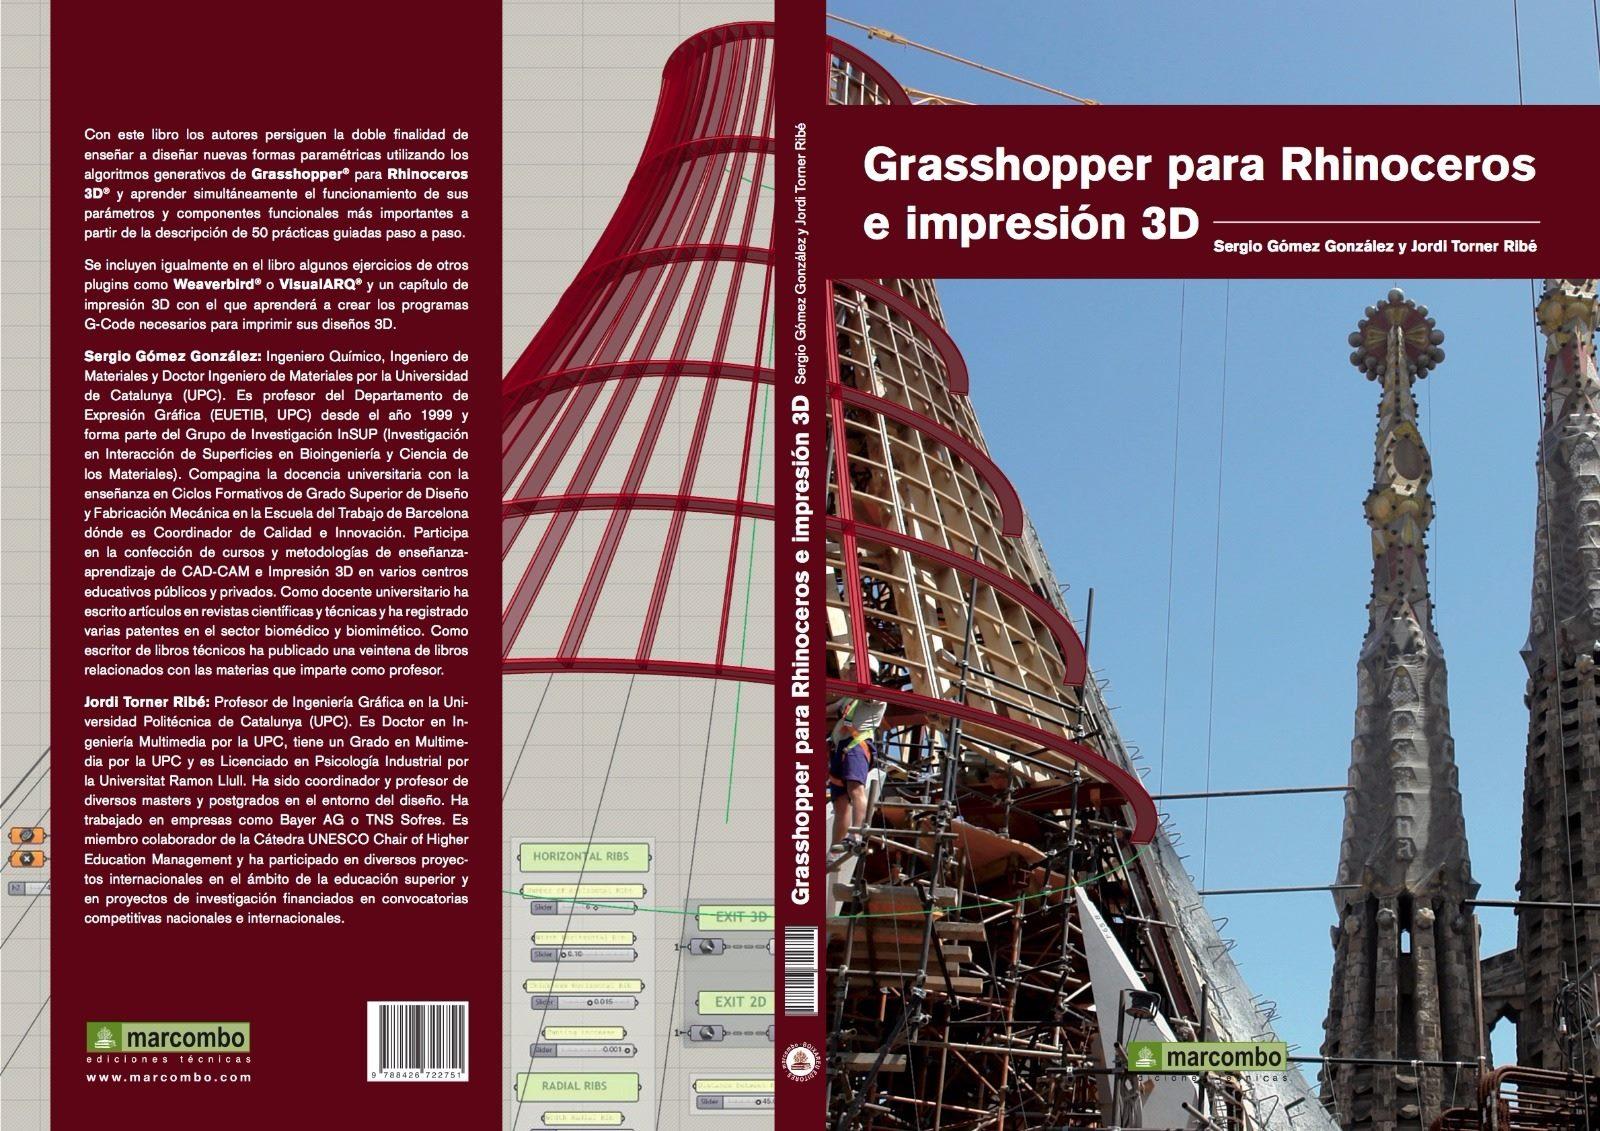 Grasshopper para Rhino e Impresion 3D